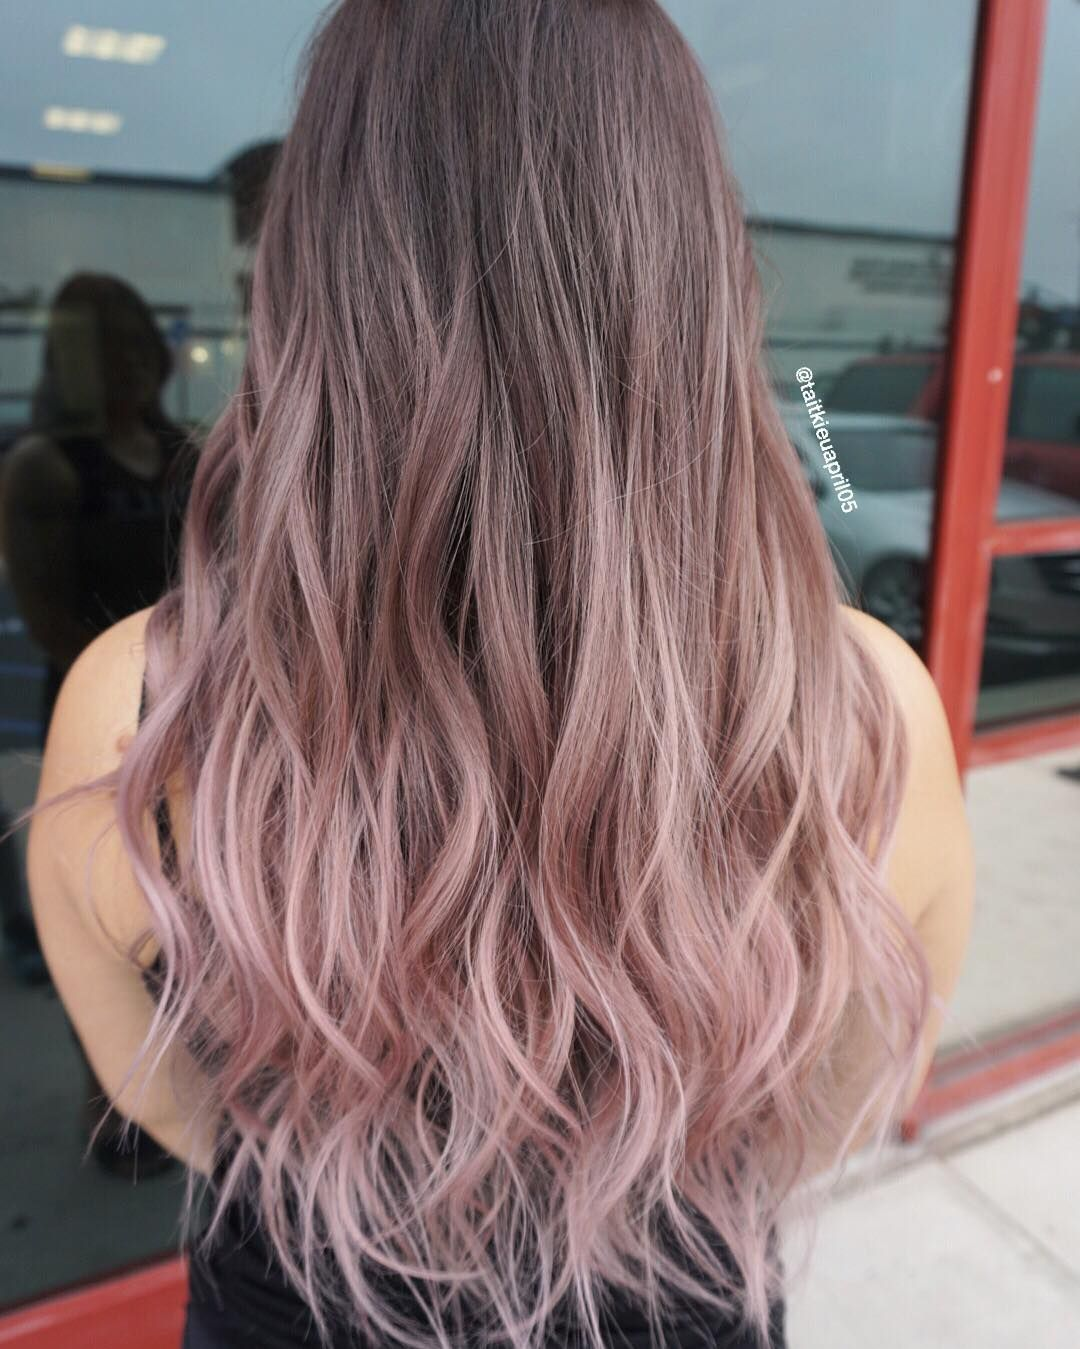 STRAWBERRY MILKSHAKE?  #olaplex @olaplex #hairslut #hairporn #hairstyle #pinkhair #modernsalon #hairdresser #violetmetallic #behindthechair #americansalon #colorcorrection #colormelt #hairpainting #pastelhair #silverhair #love #blondehair #platinumblonde #whiteblonde #icyblonde #grannyhair #balayage #ombre #asianblonde #silvermetallic #silverblonde #platinumblonde